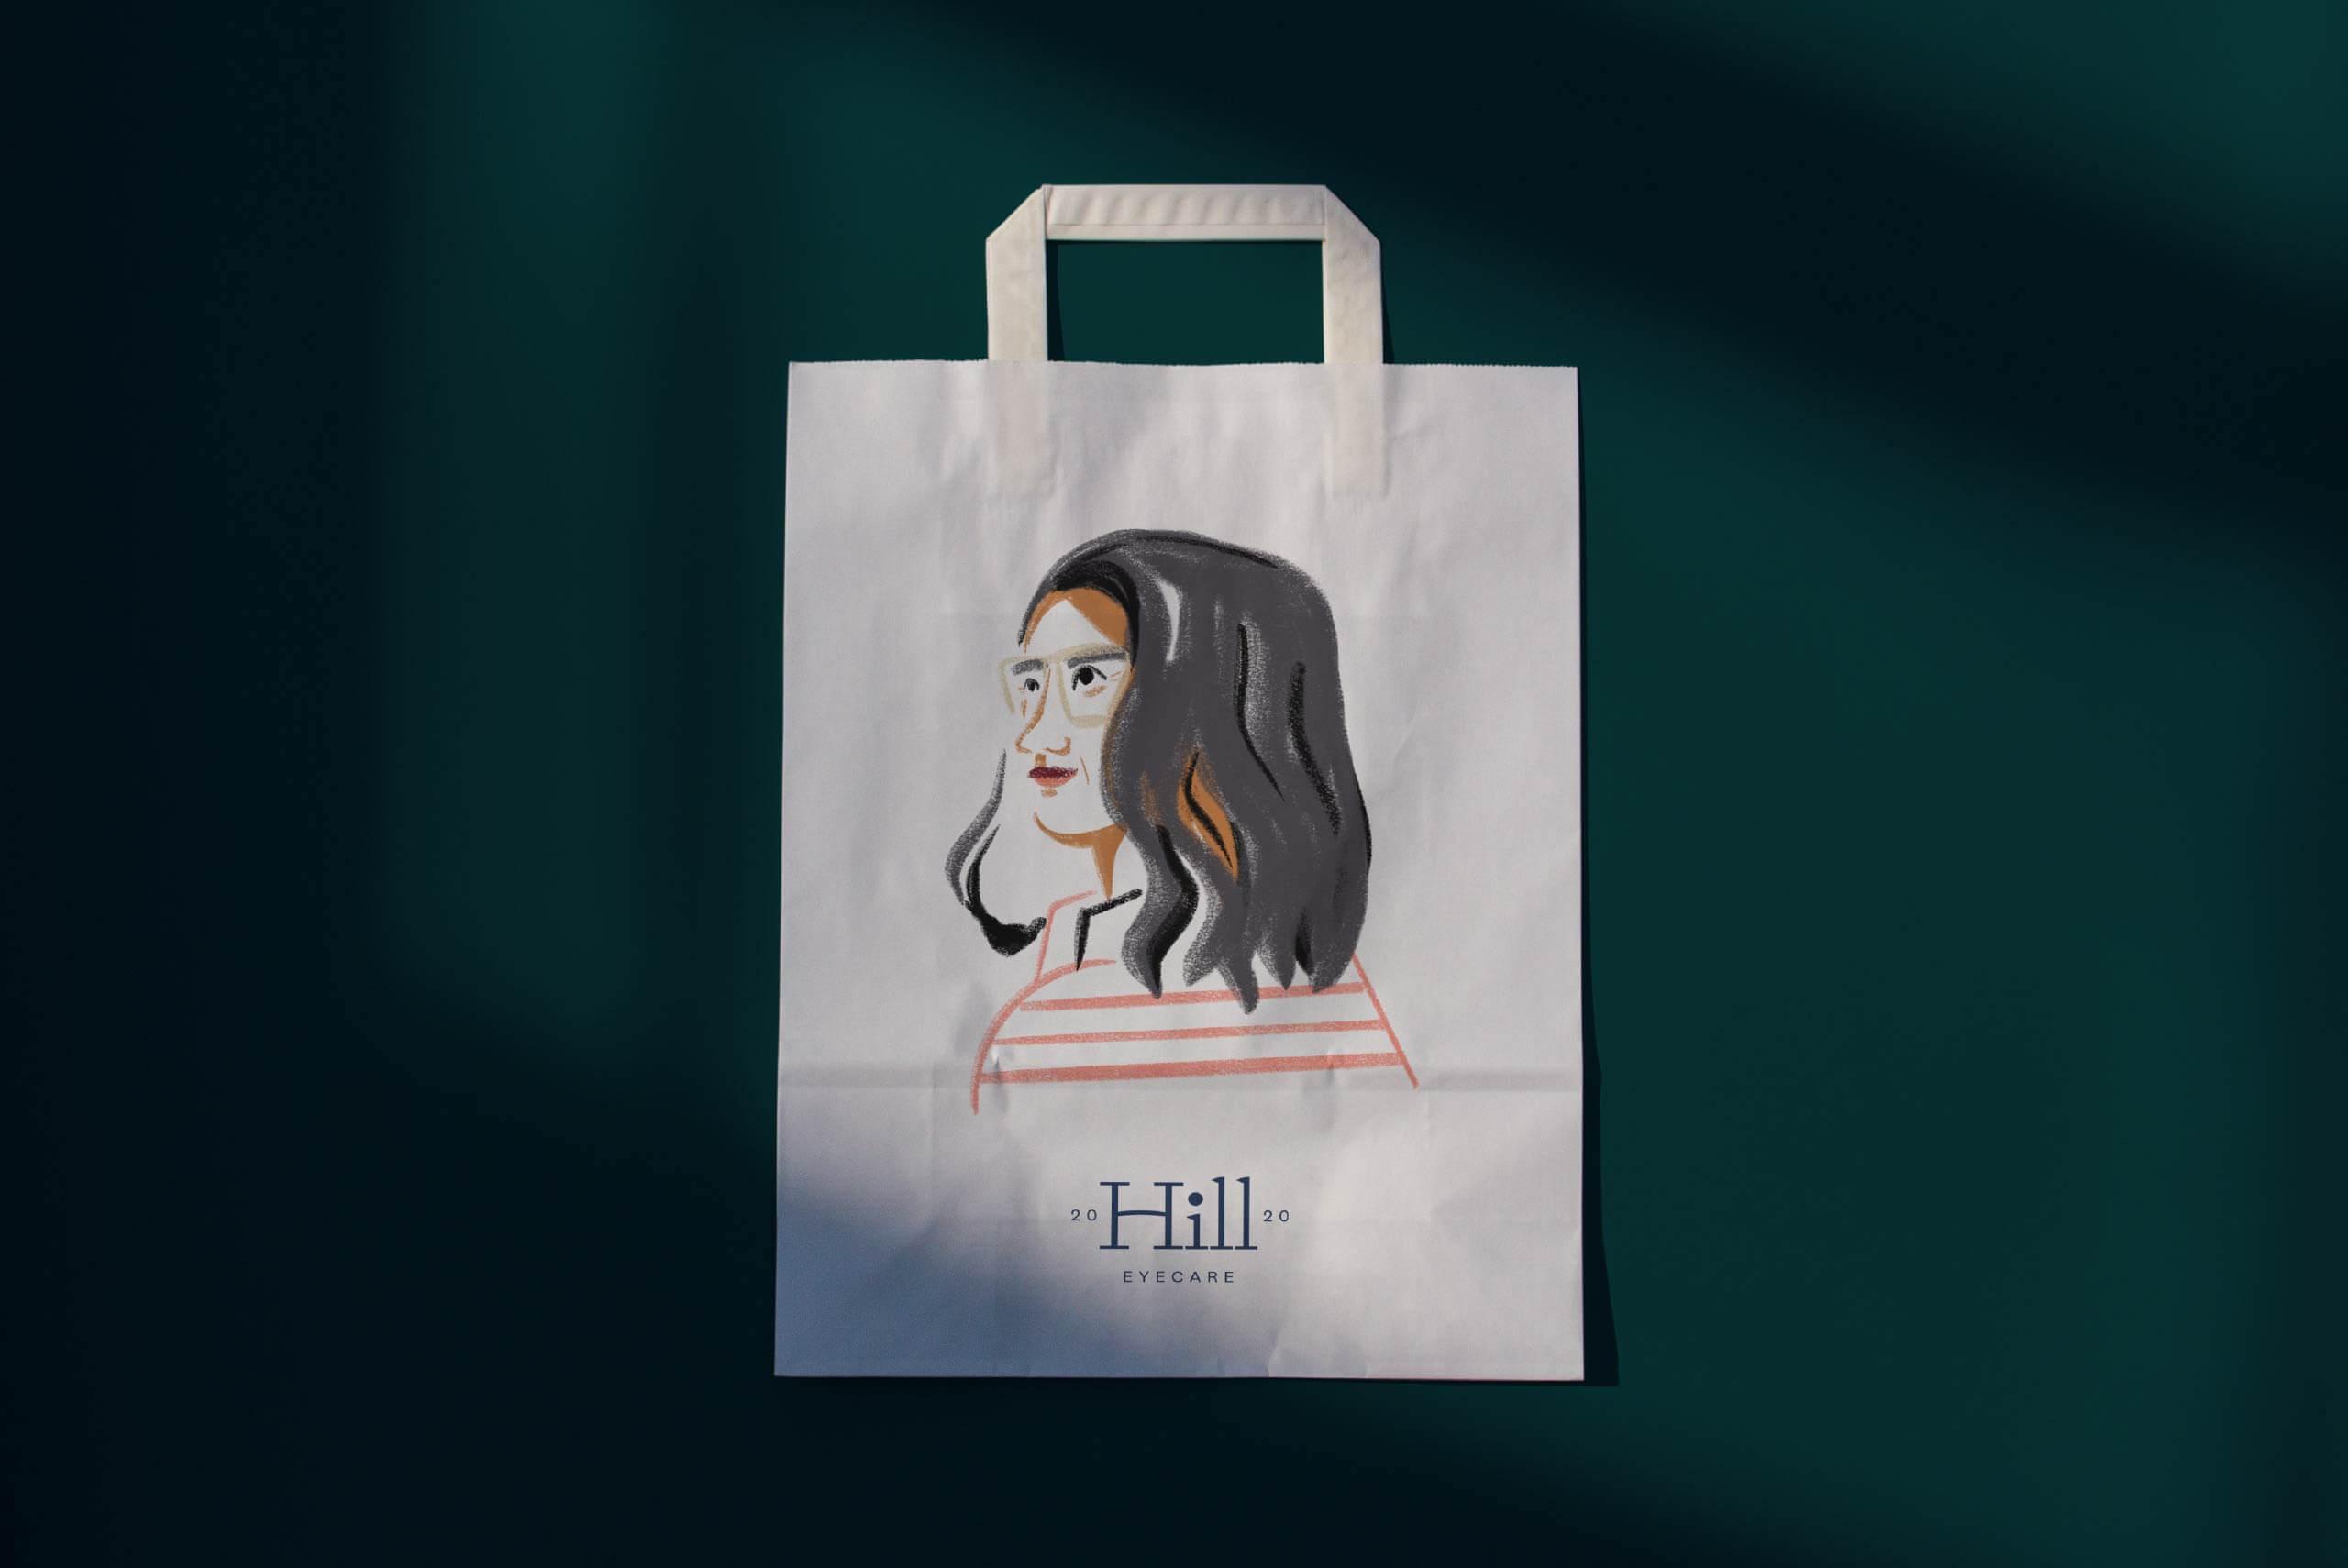 FRH-Hill-Eyecare1-copy-6